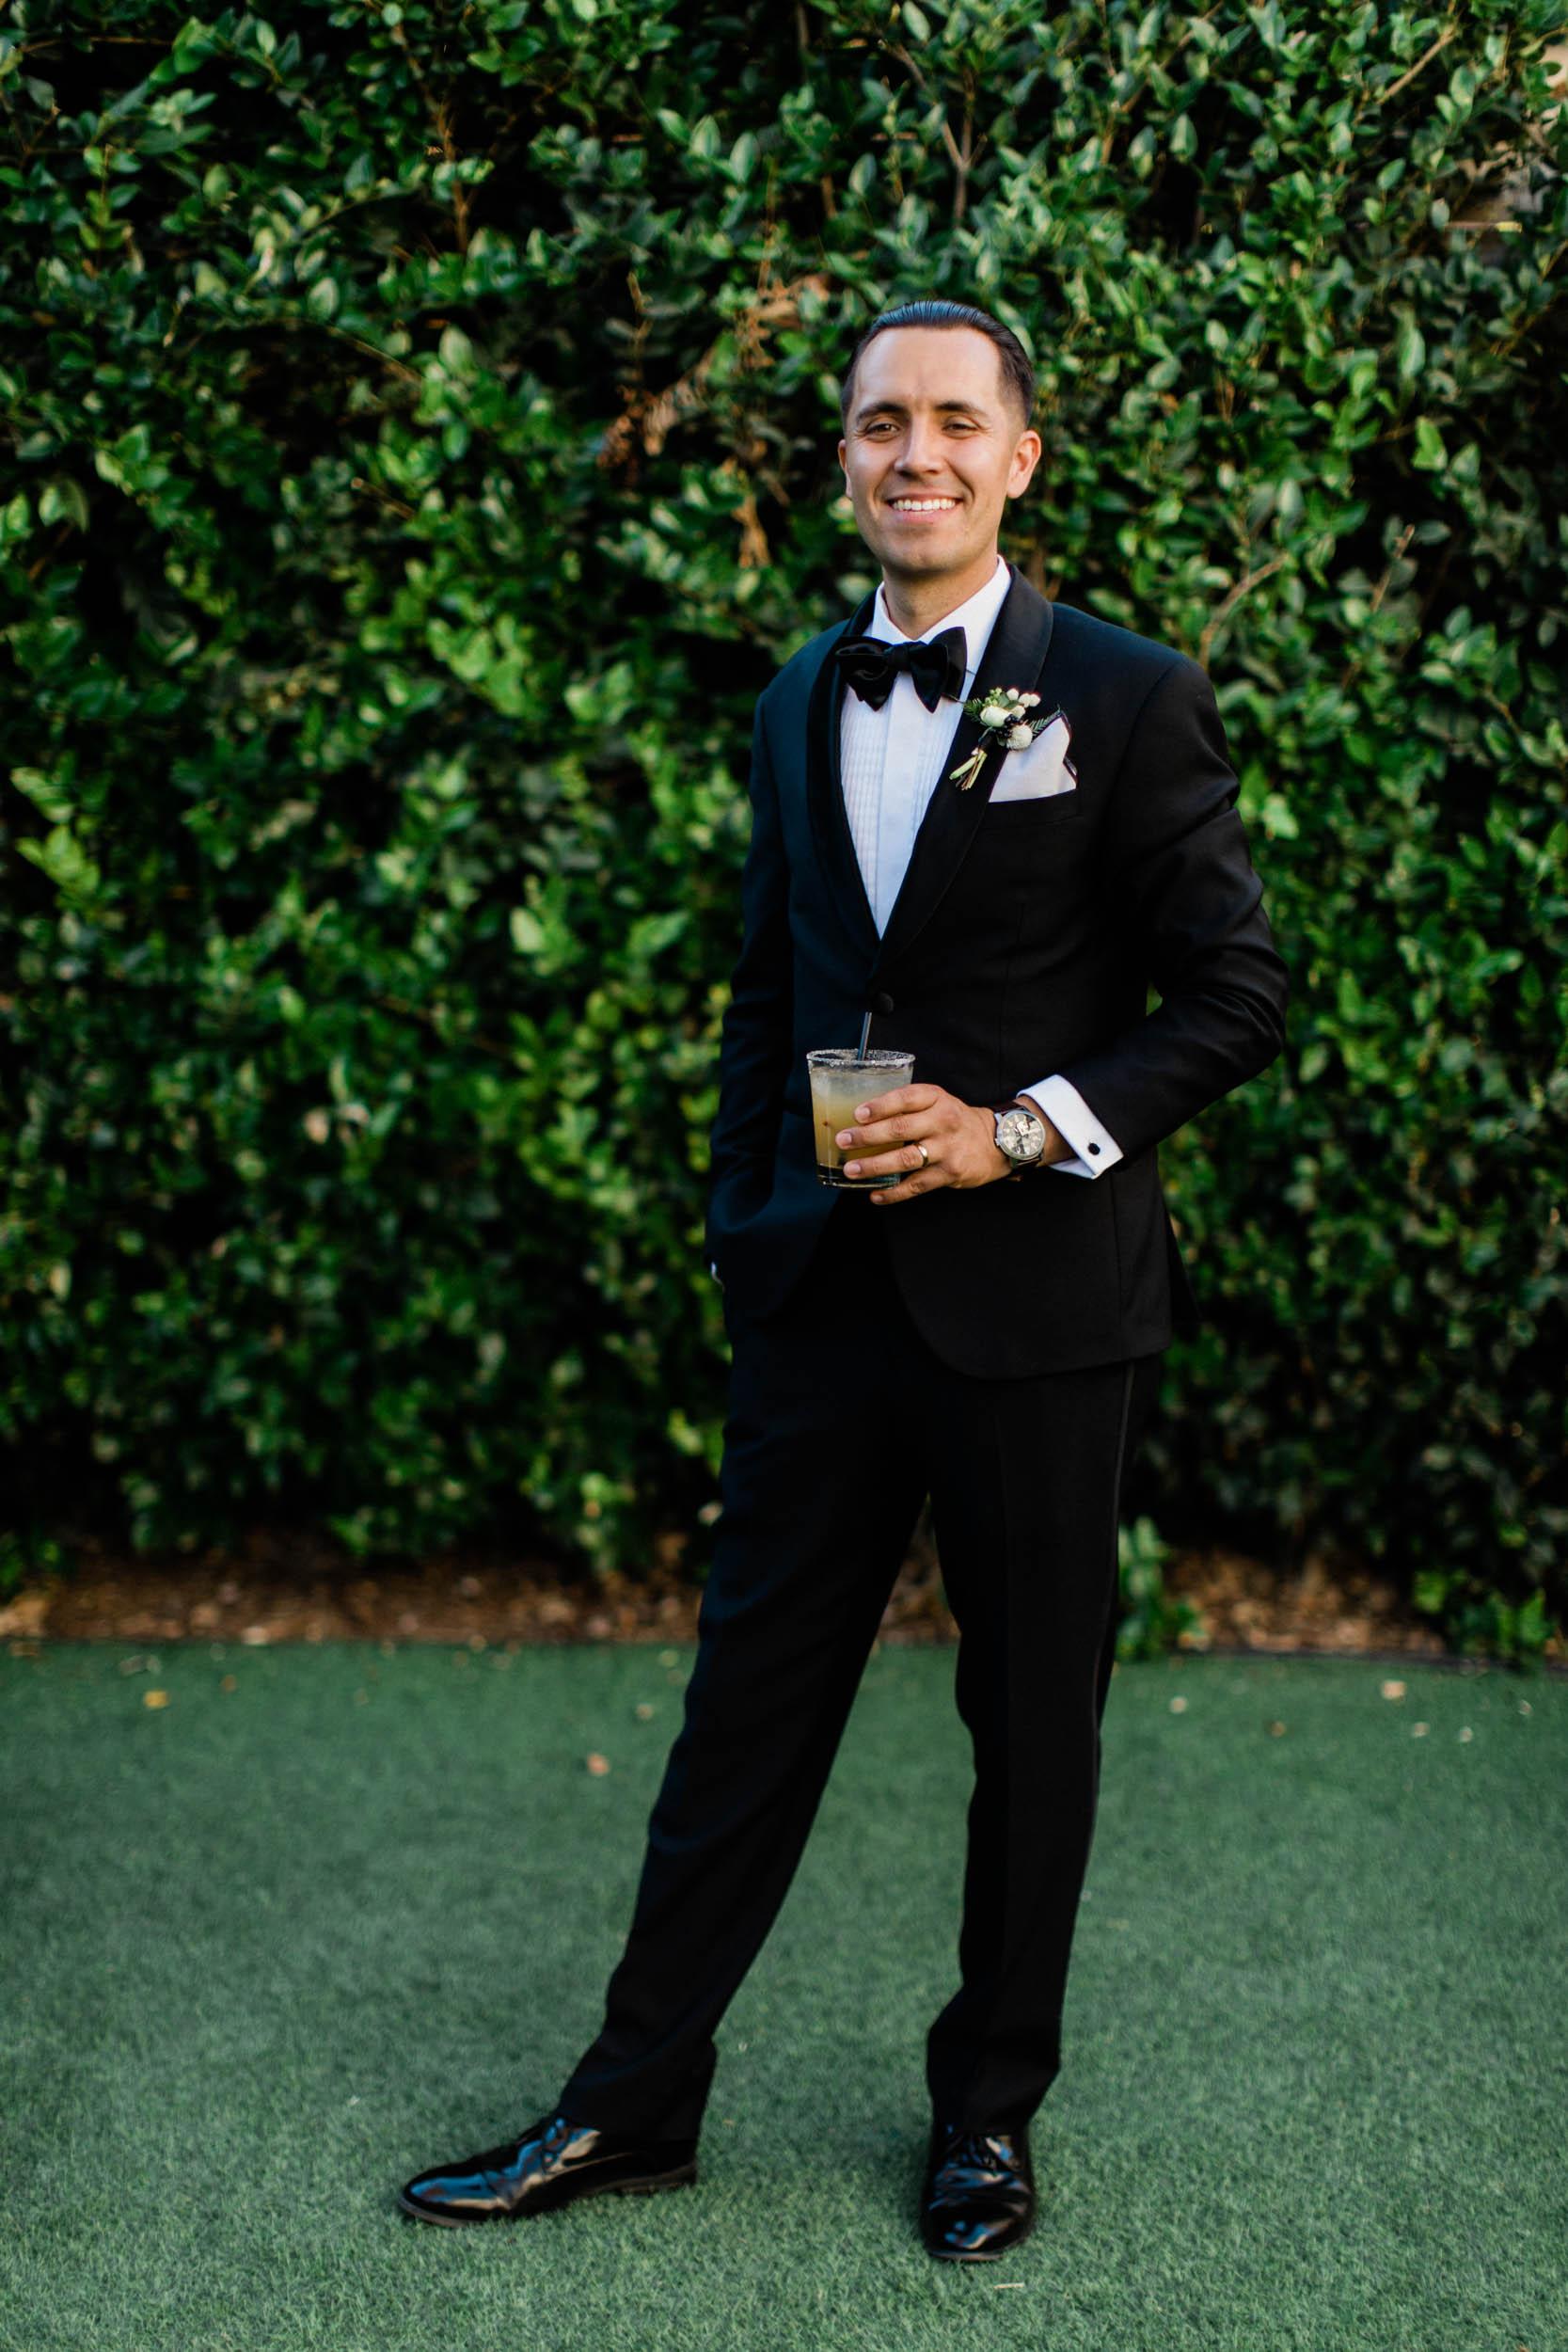 BKM-Photography-Los-Angeles-Highland-Park-York-Manor-Wedding-Photography-0819.jpg